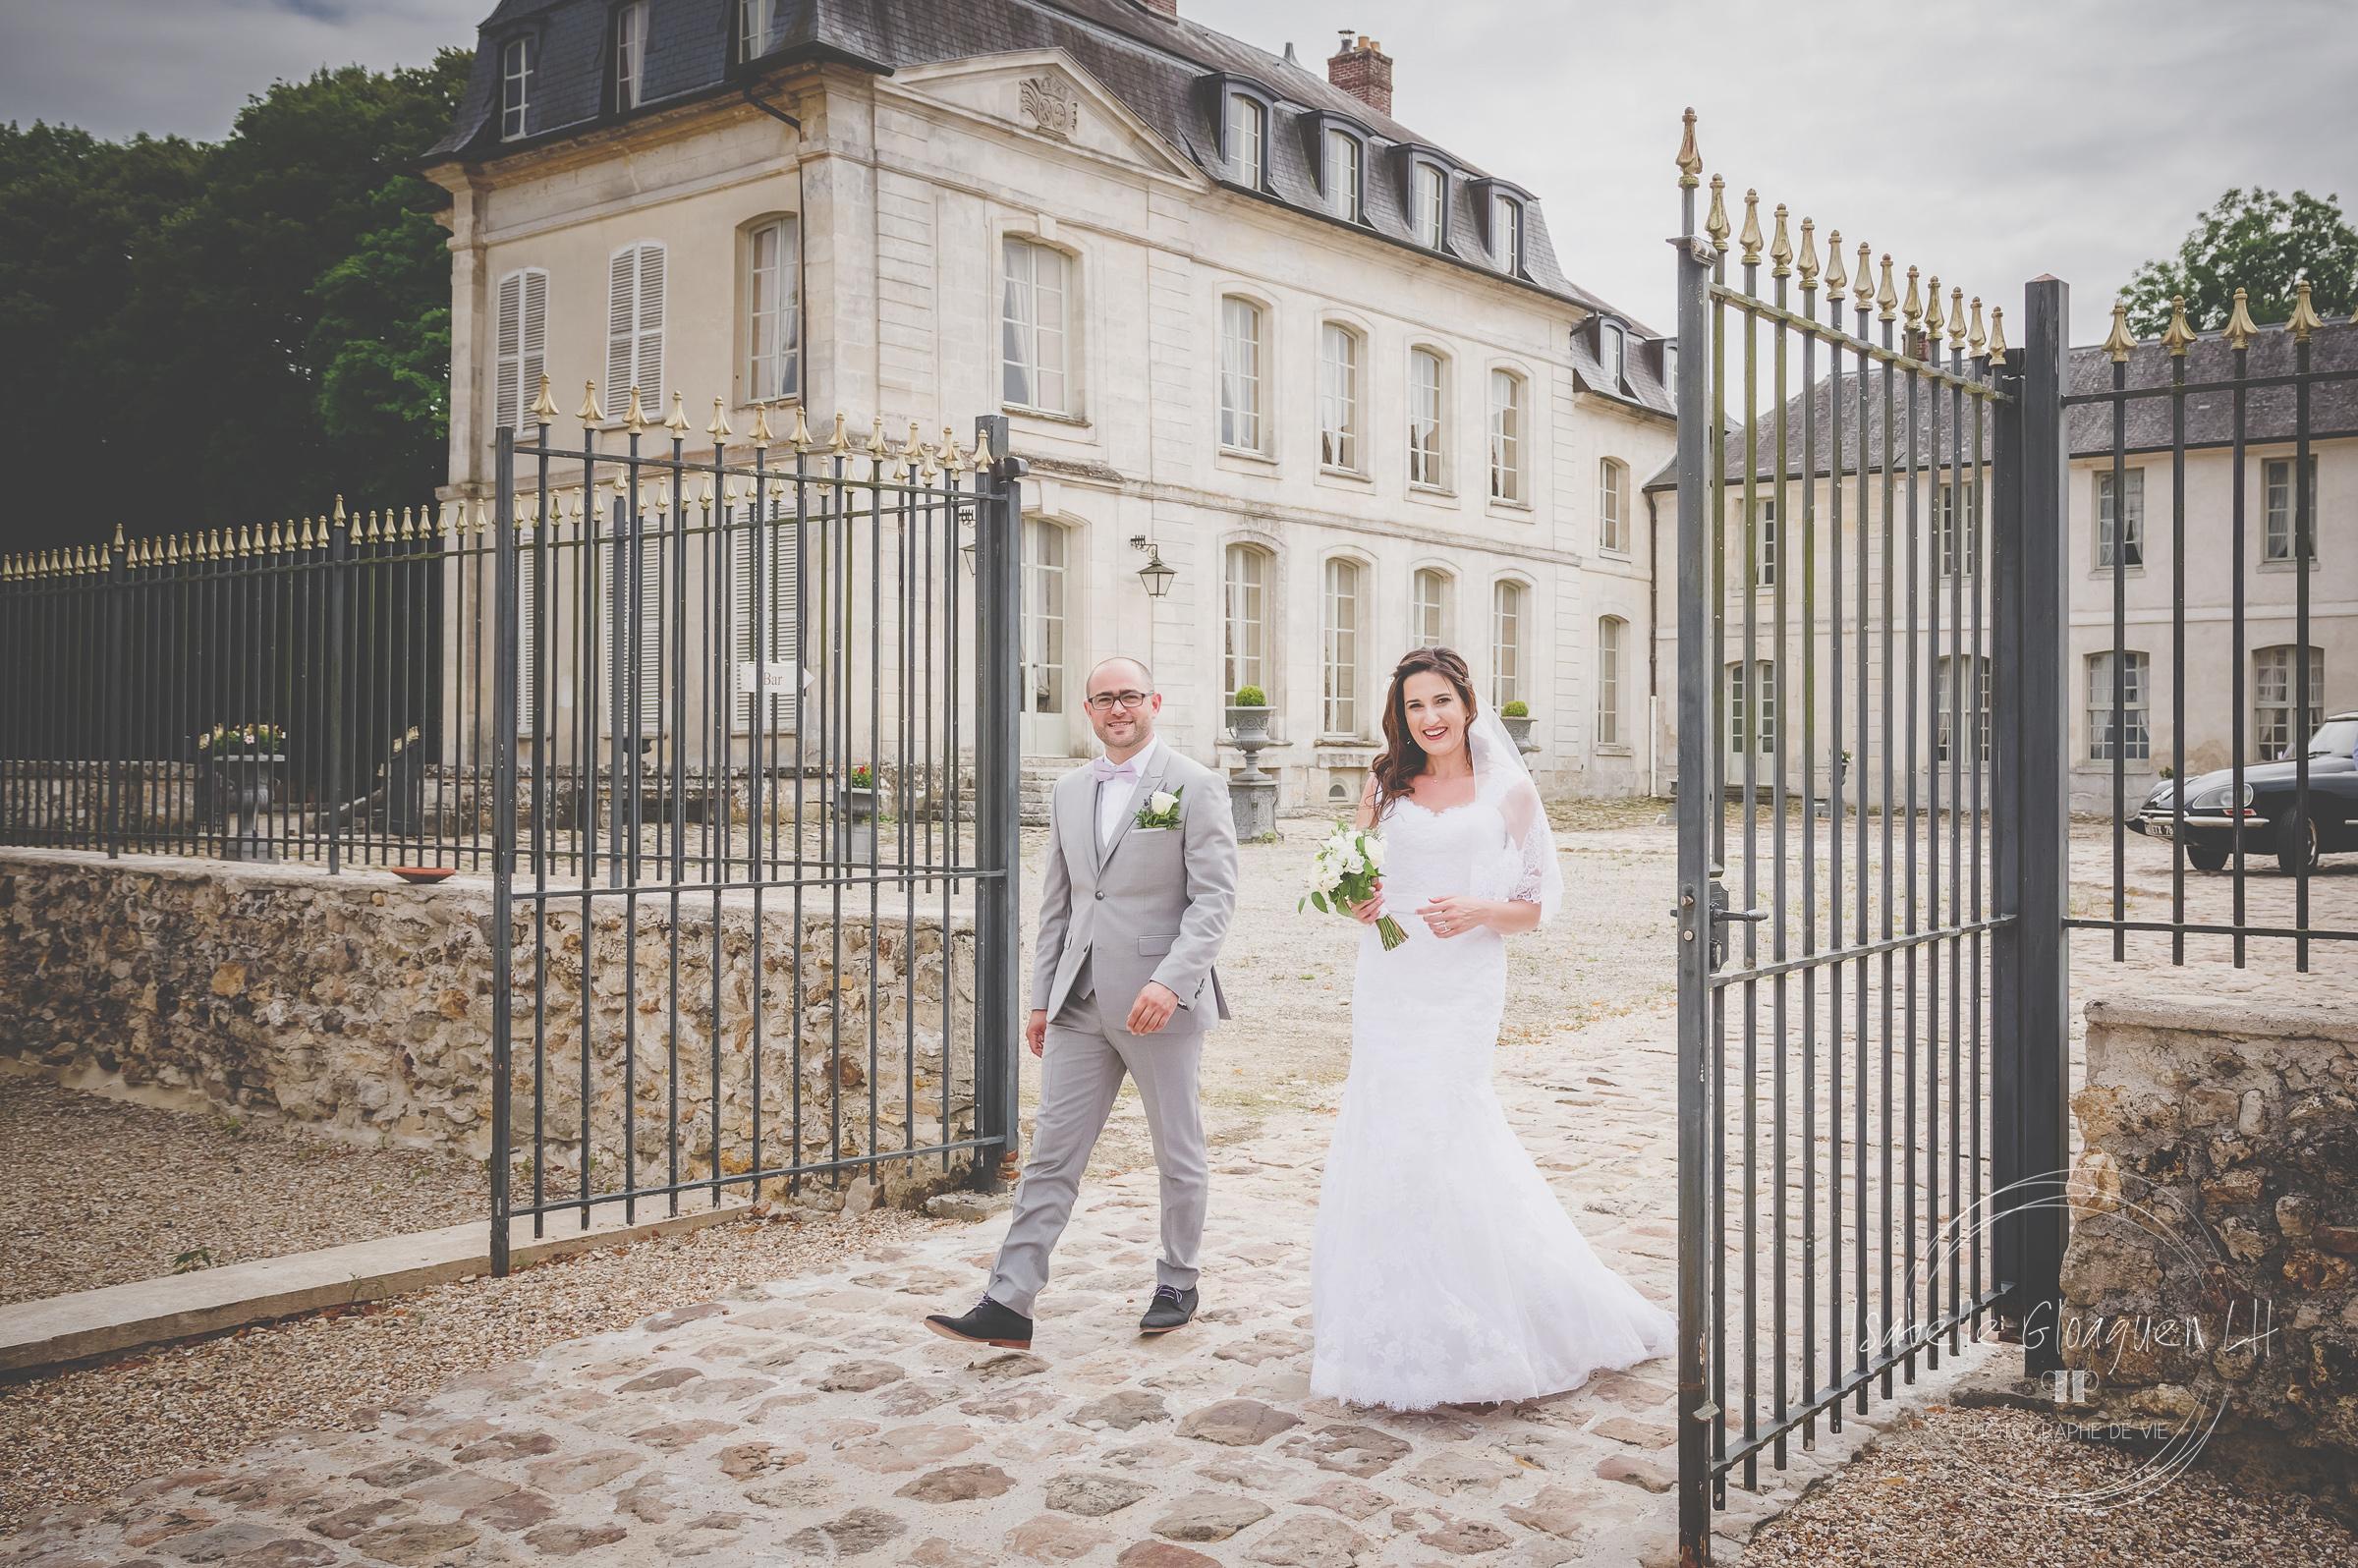 Photographe-Mariage-Bretagne-Gloaguen-A&G-76